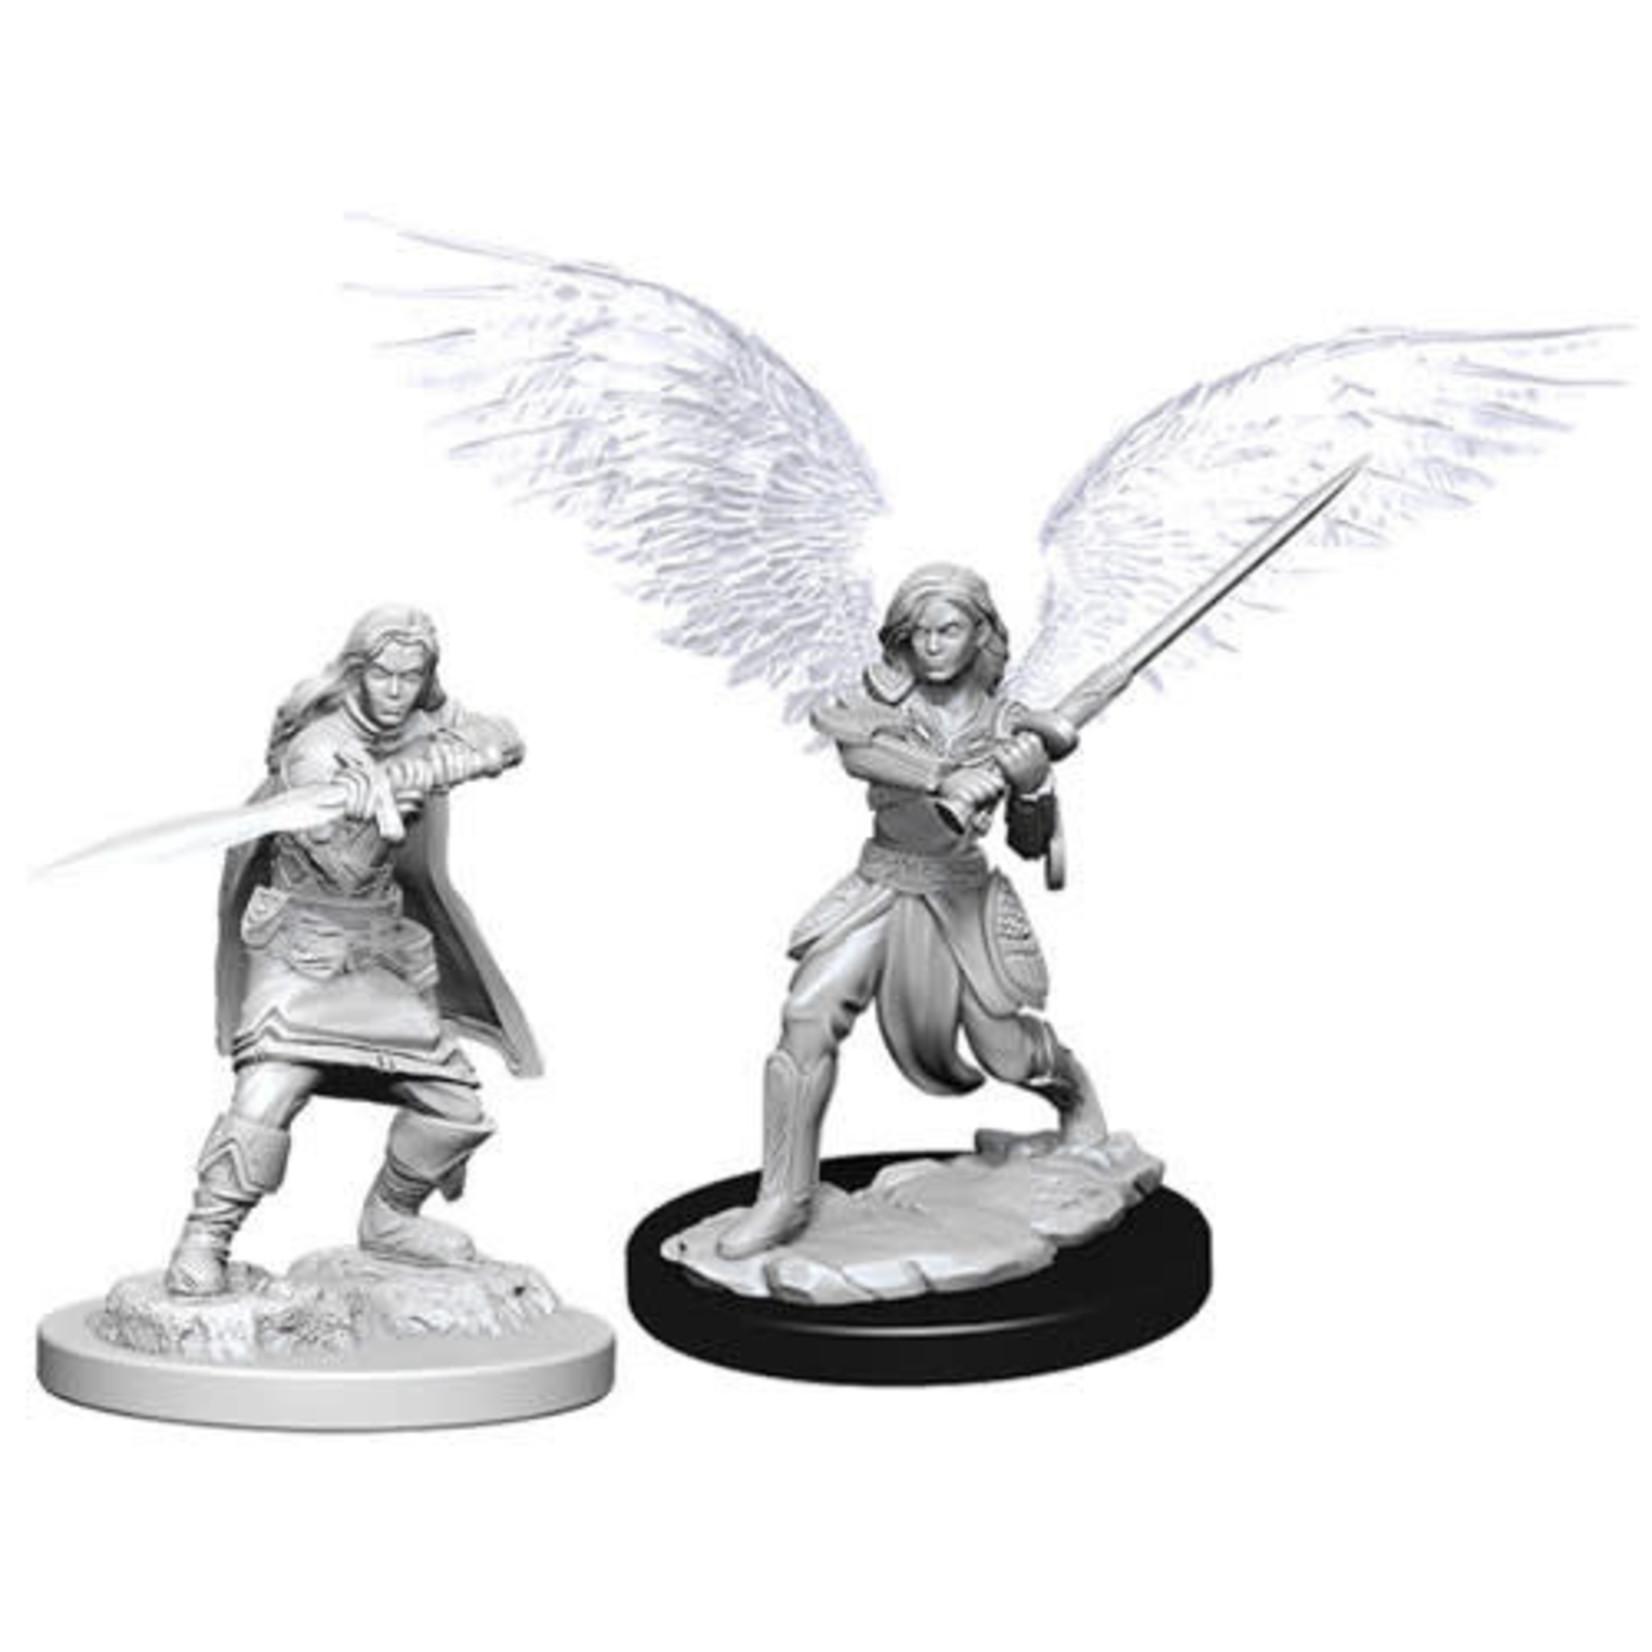 D&D Unpainted Minis: Female Aasimar Fighter